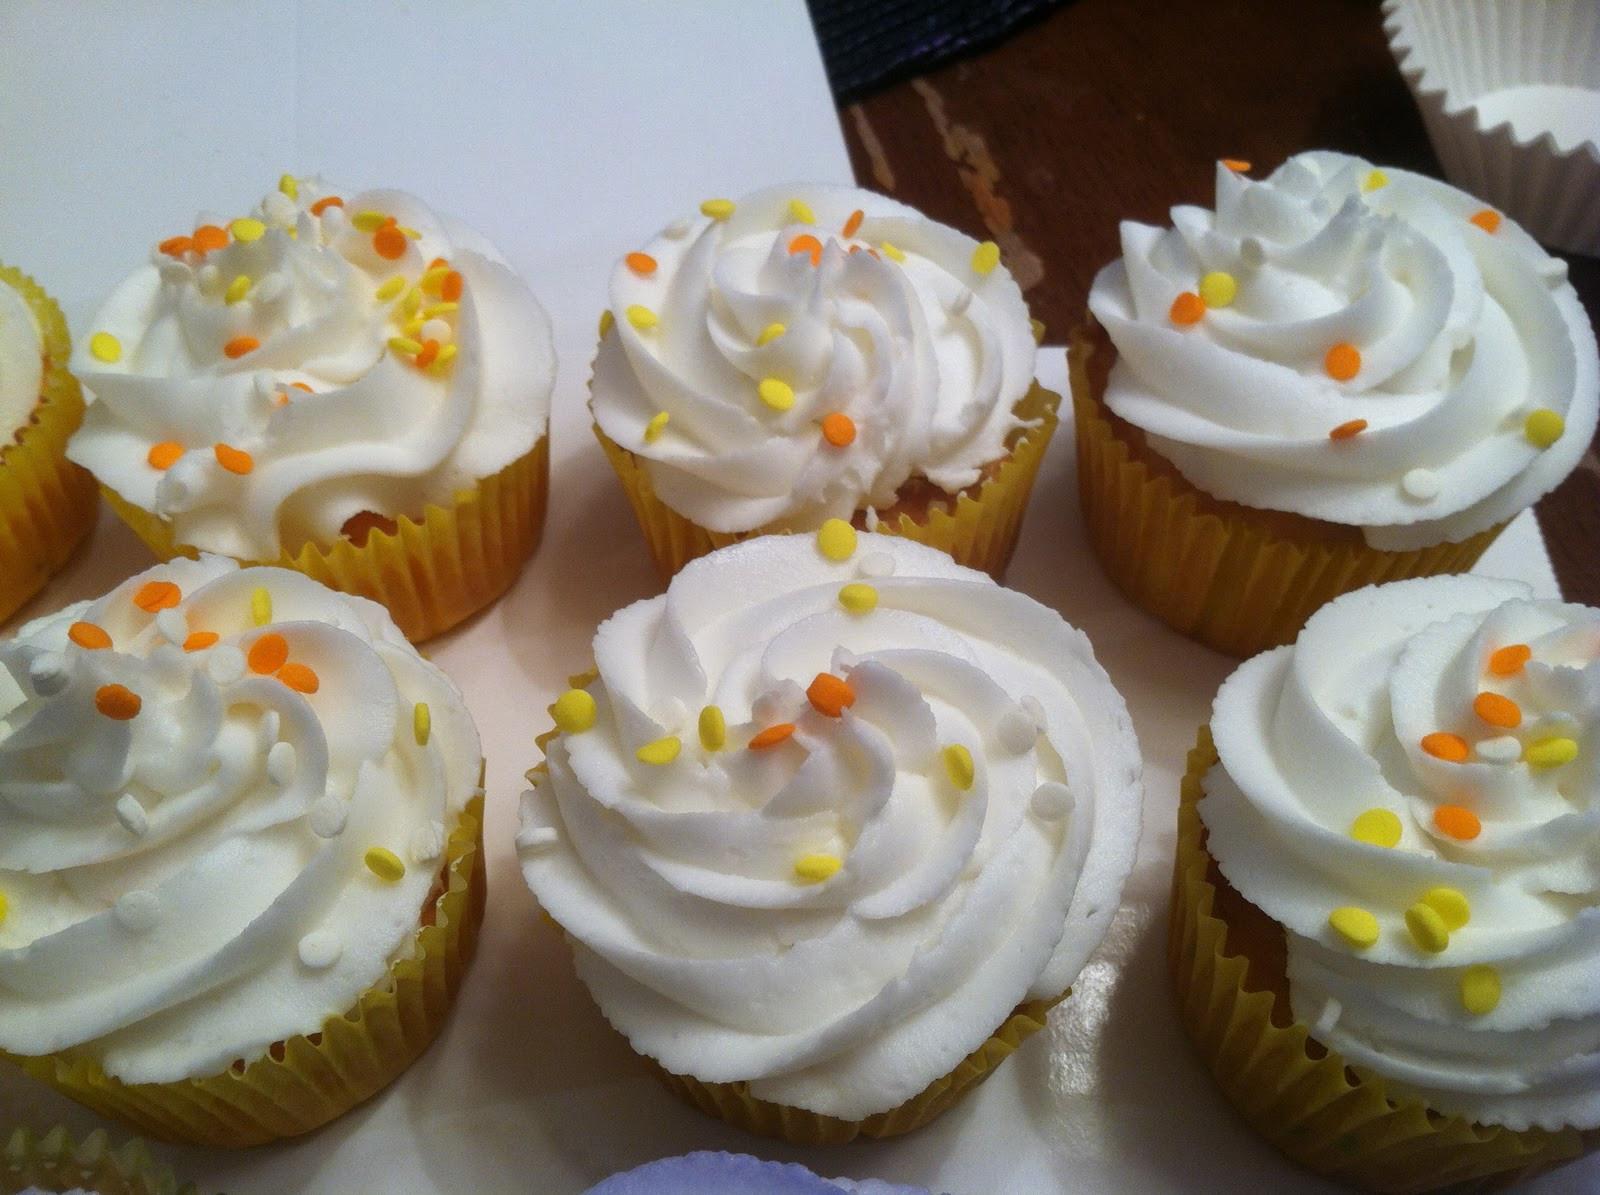 Halloween Themed Cupcakes  Kyla s Cupcakes Halloween themed cupcakes